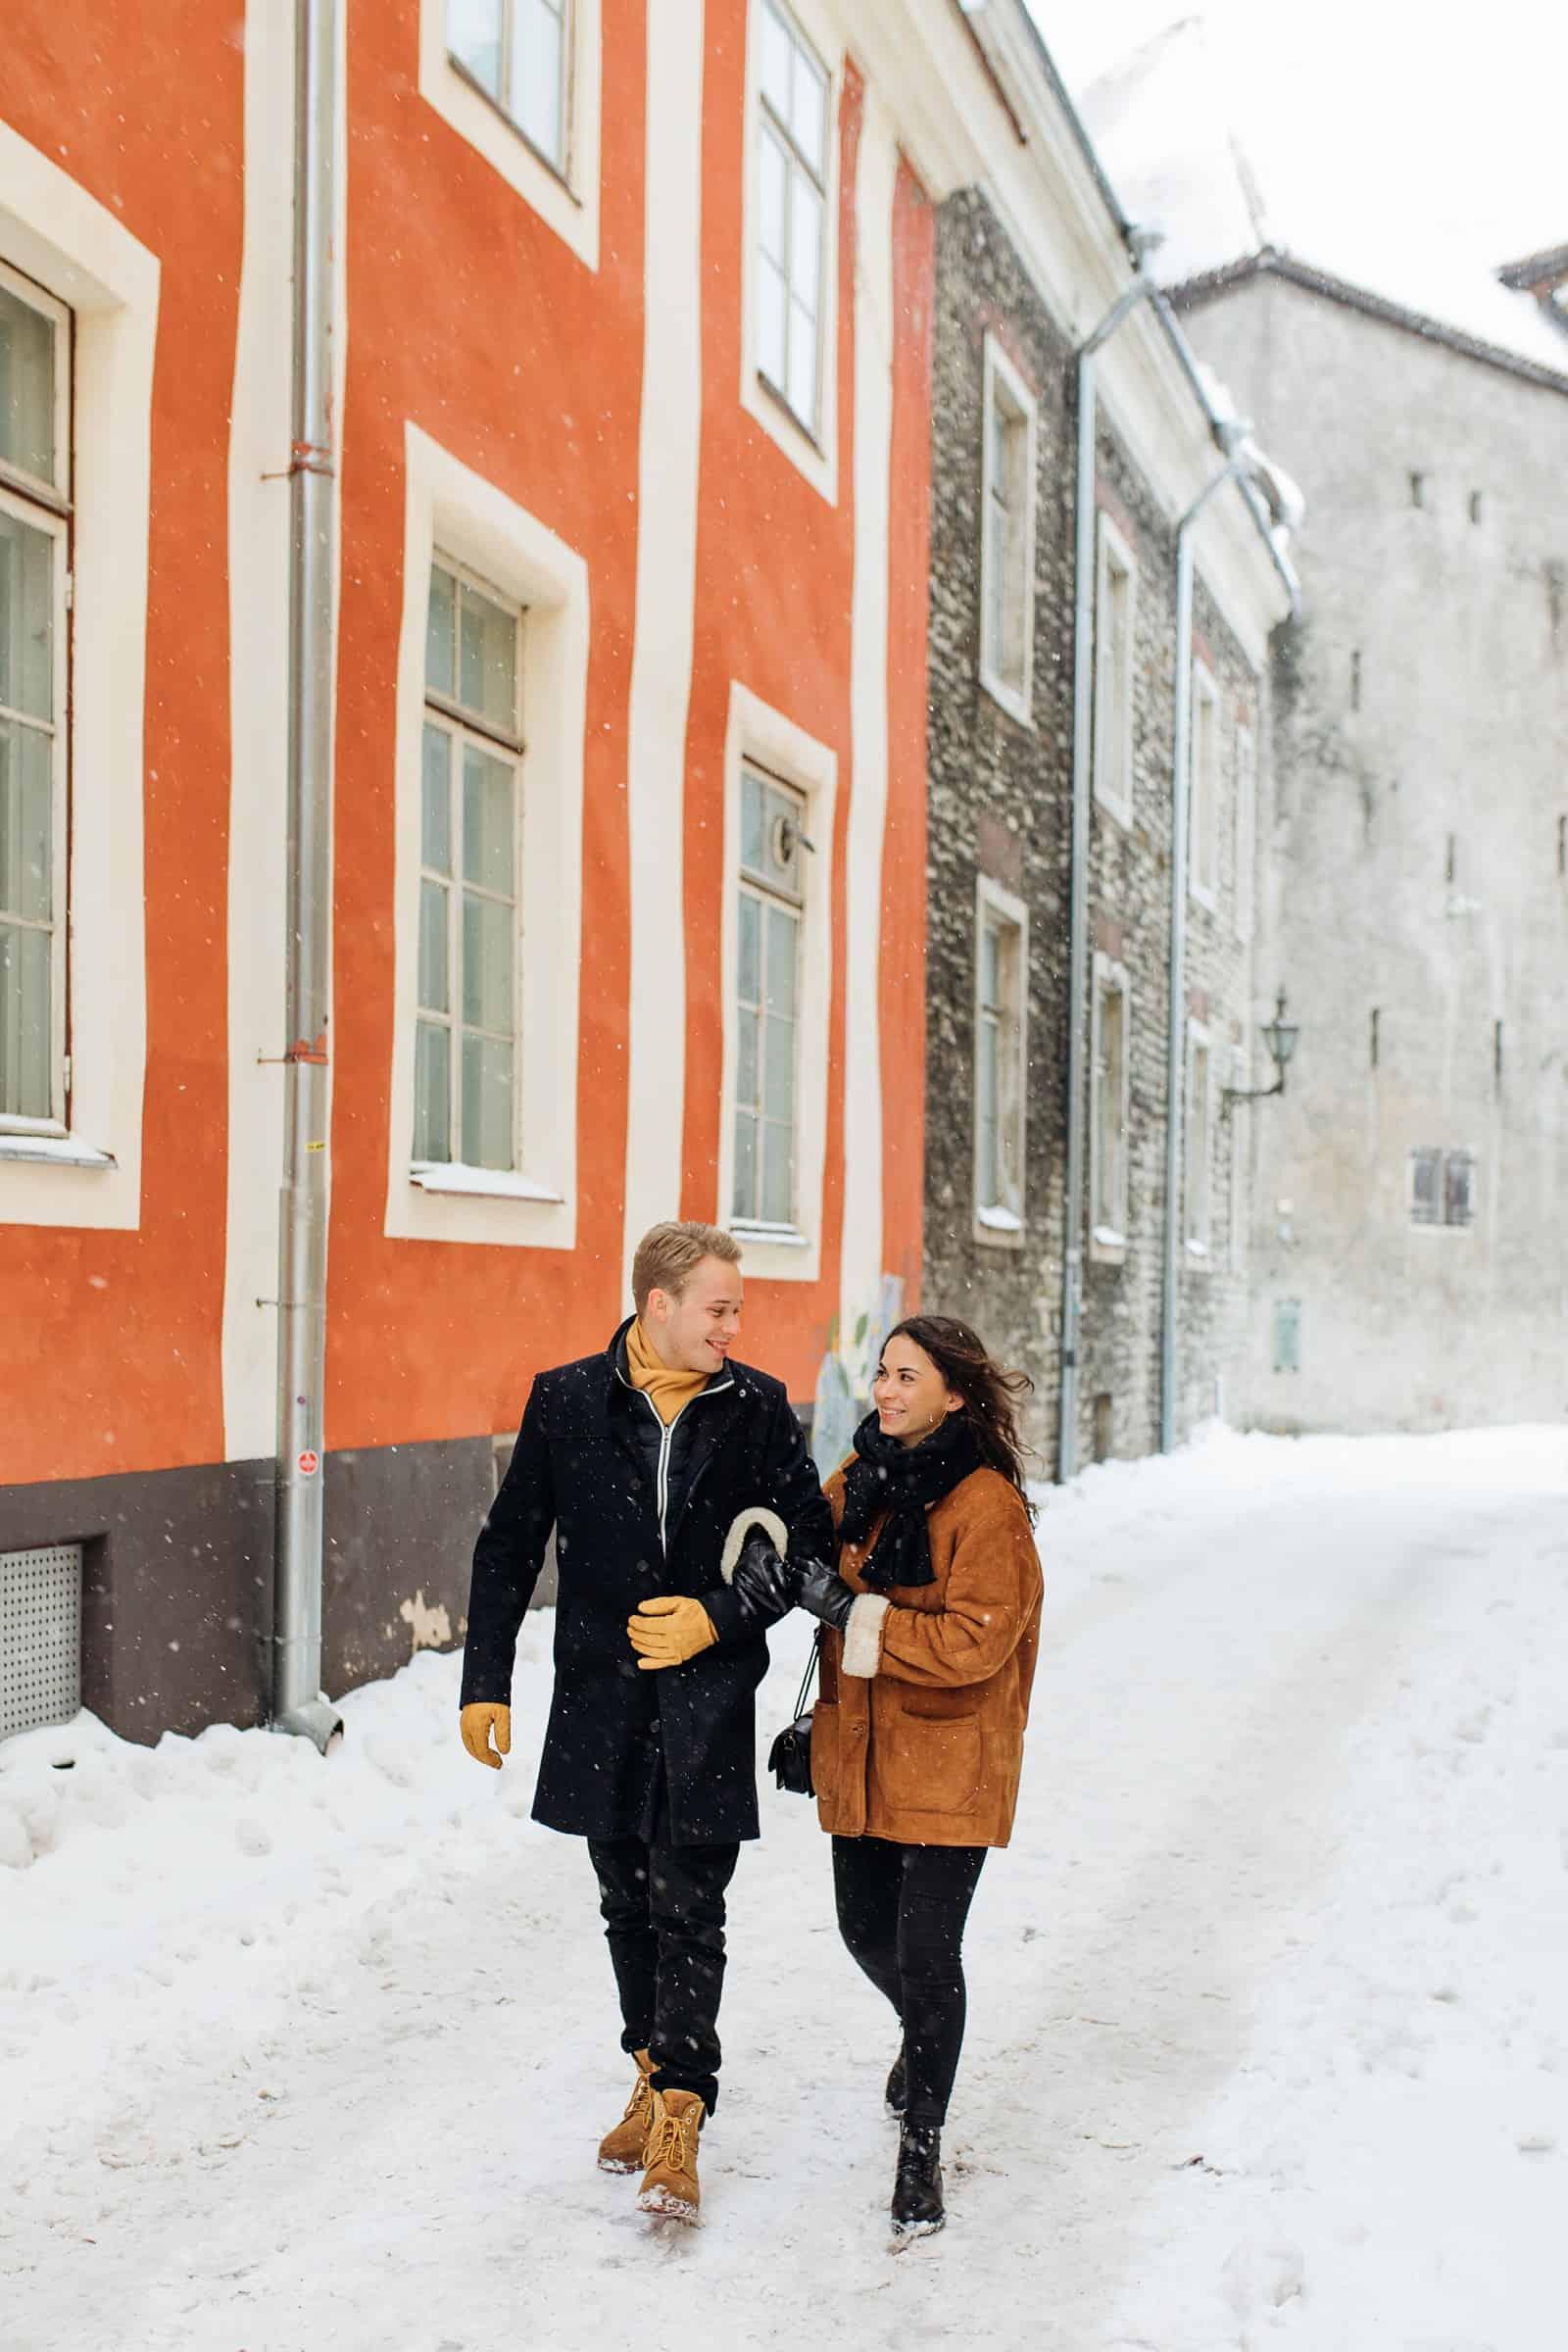 estonia engagement pictures, European city, travel photography, orange building, charming town